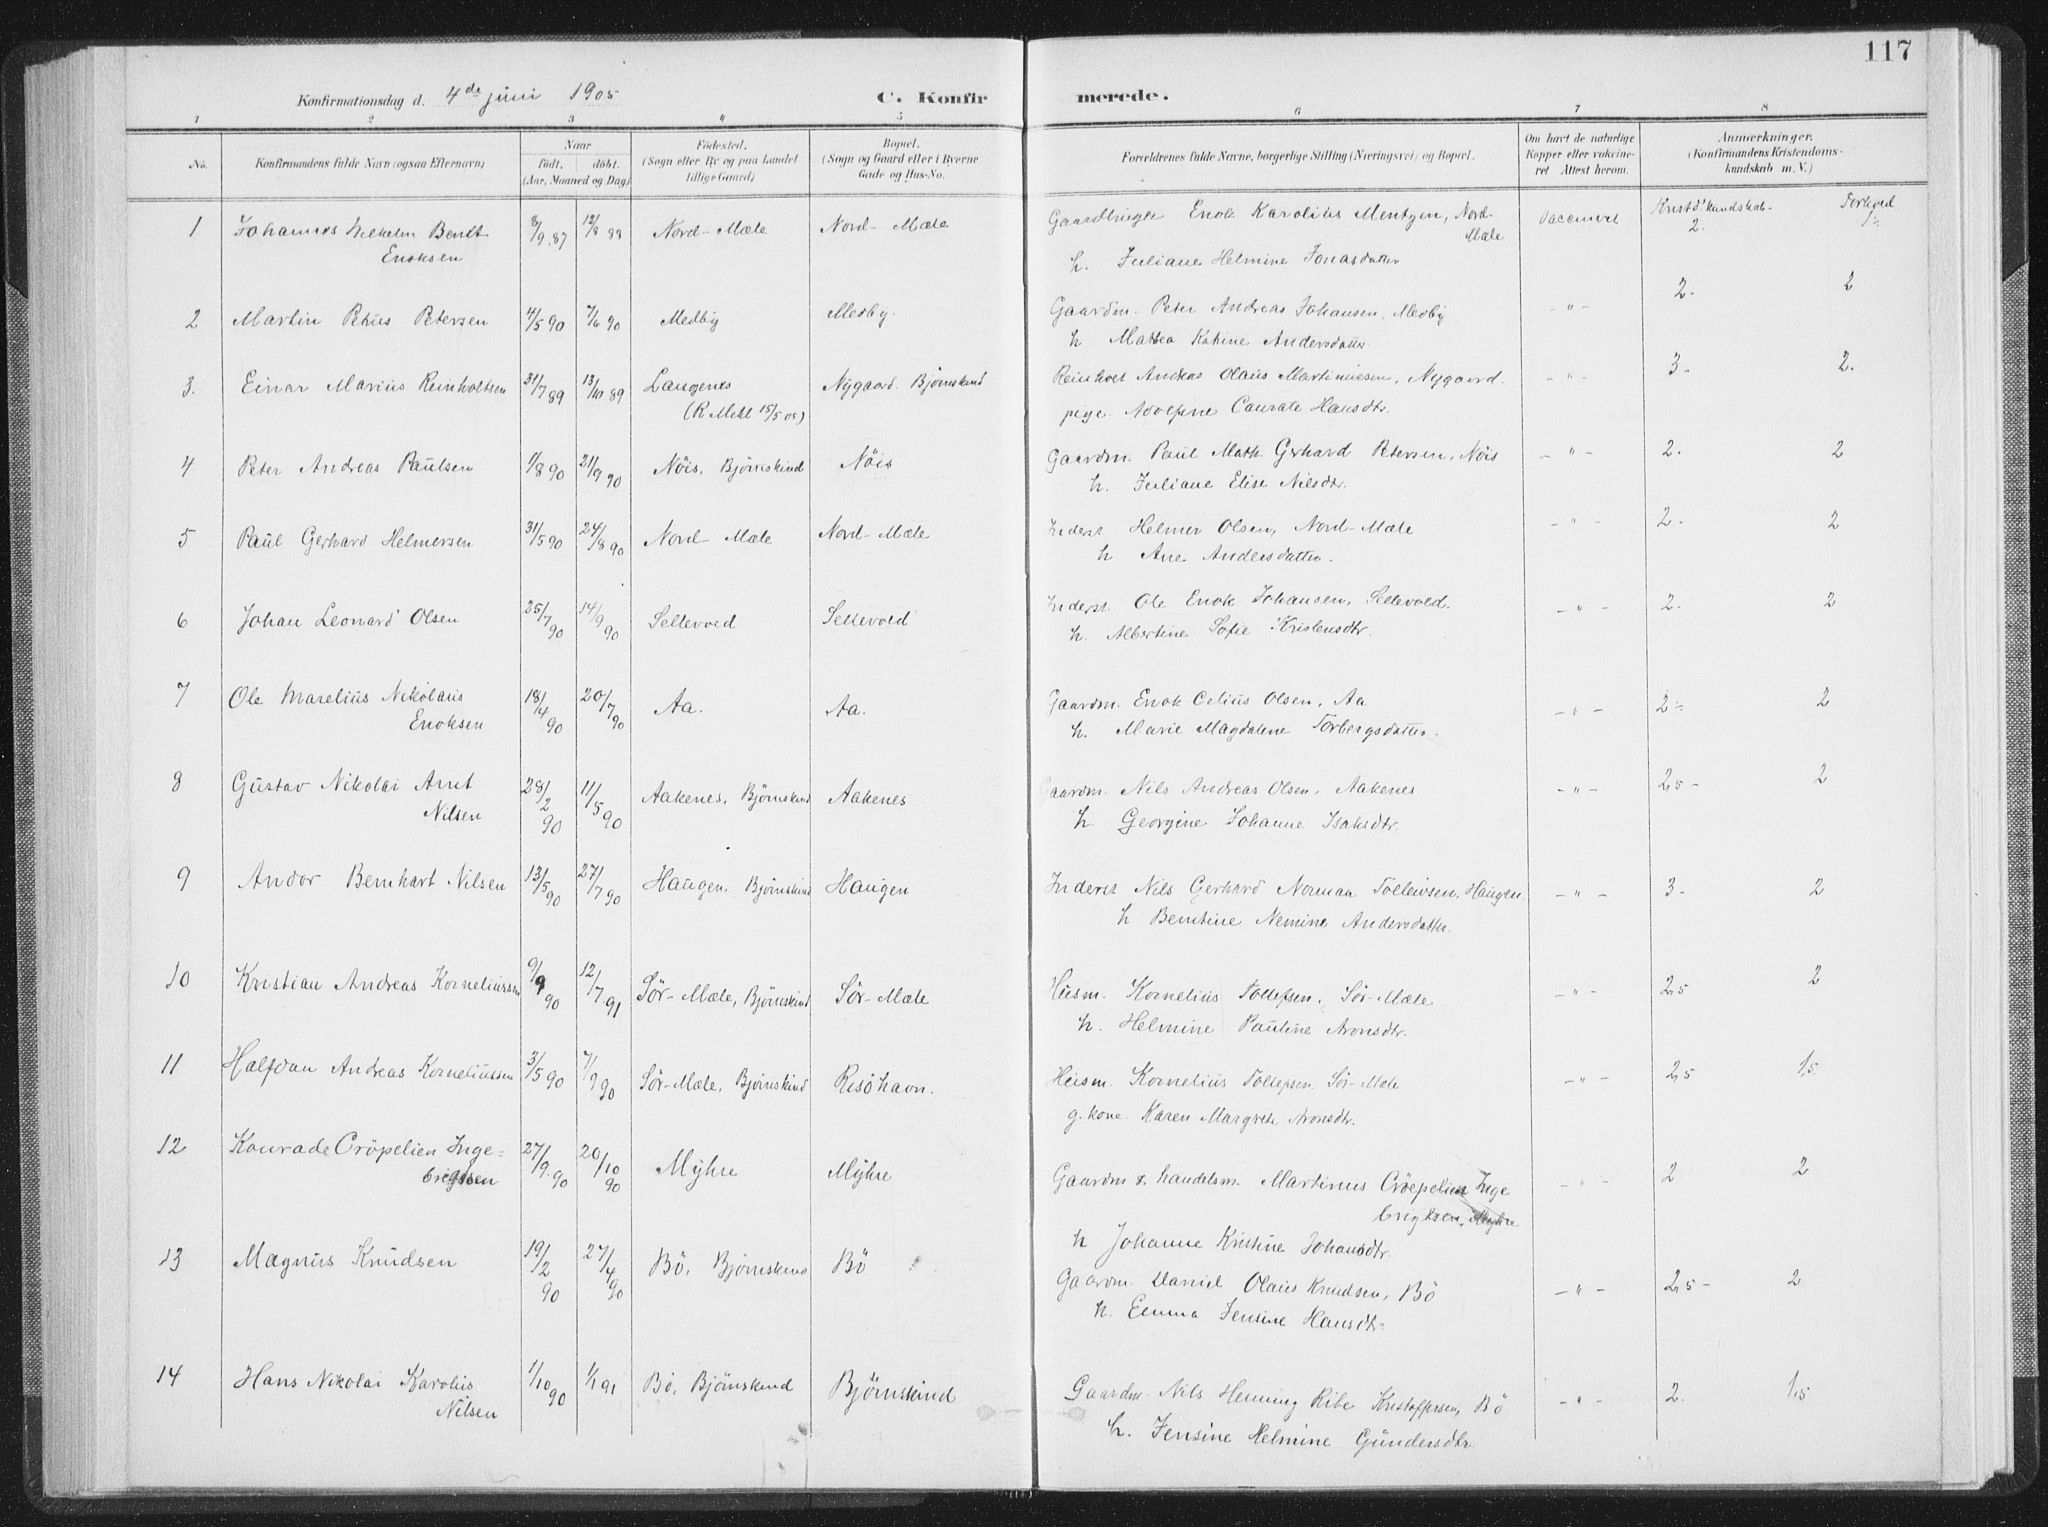 SAT, Ministerialprotokoller, klokkerbøker og fødselsregistre - Nordland, 897/L1400: Ministerialbok nr. 897A07, 1897-1908, s. 117